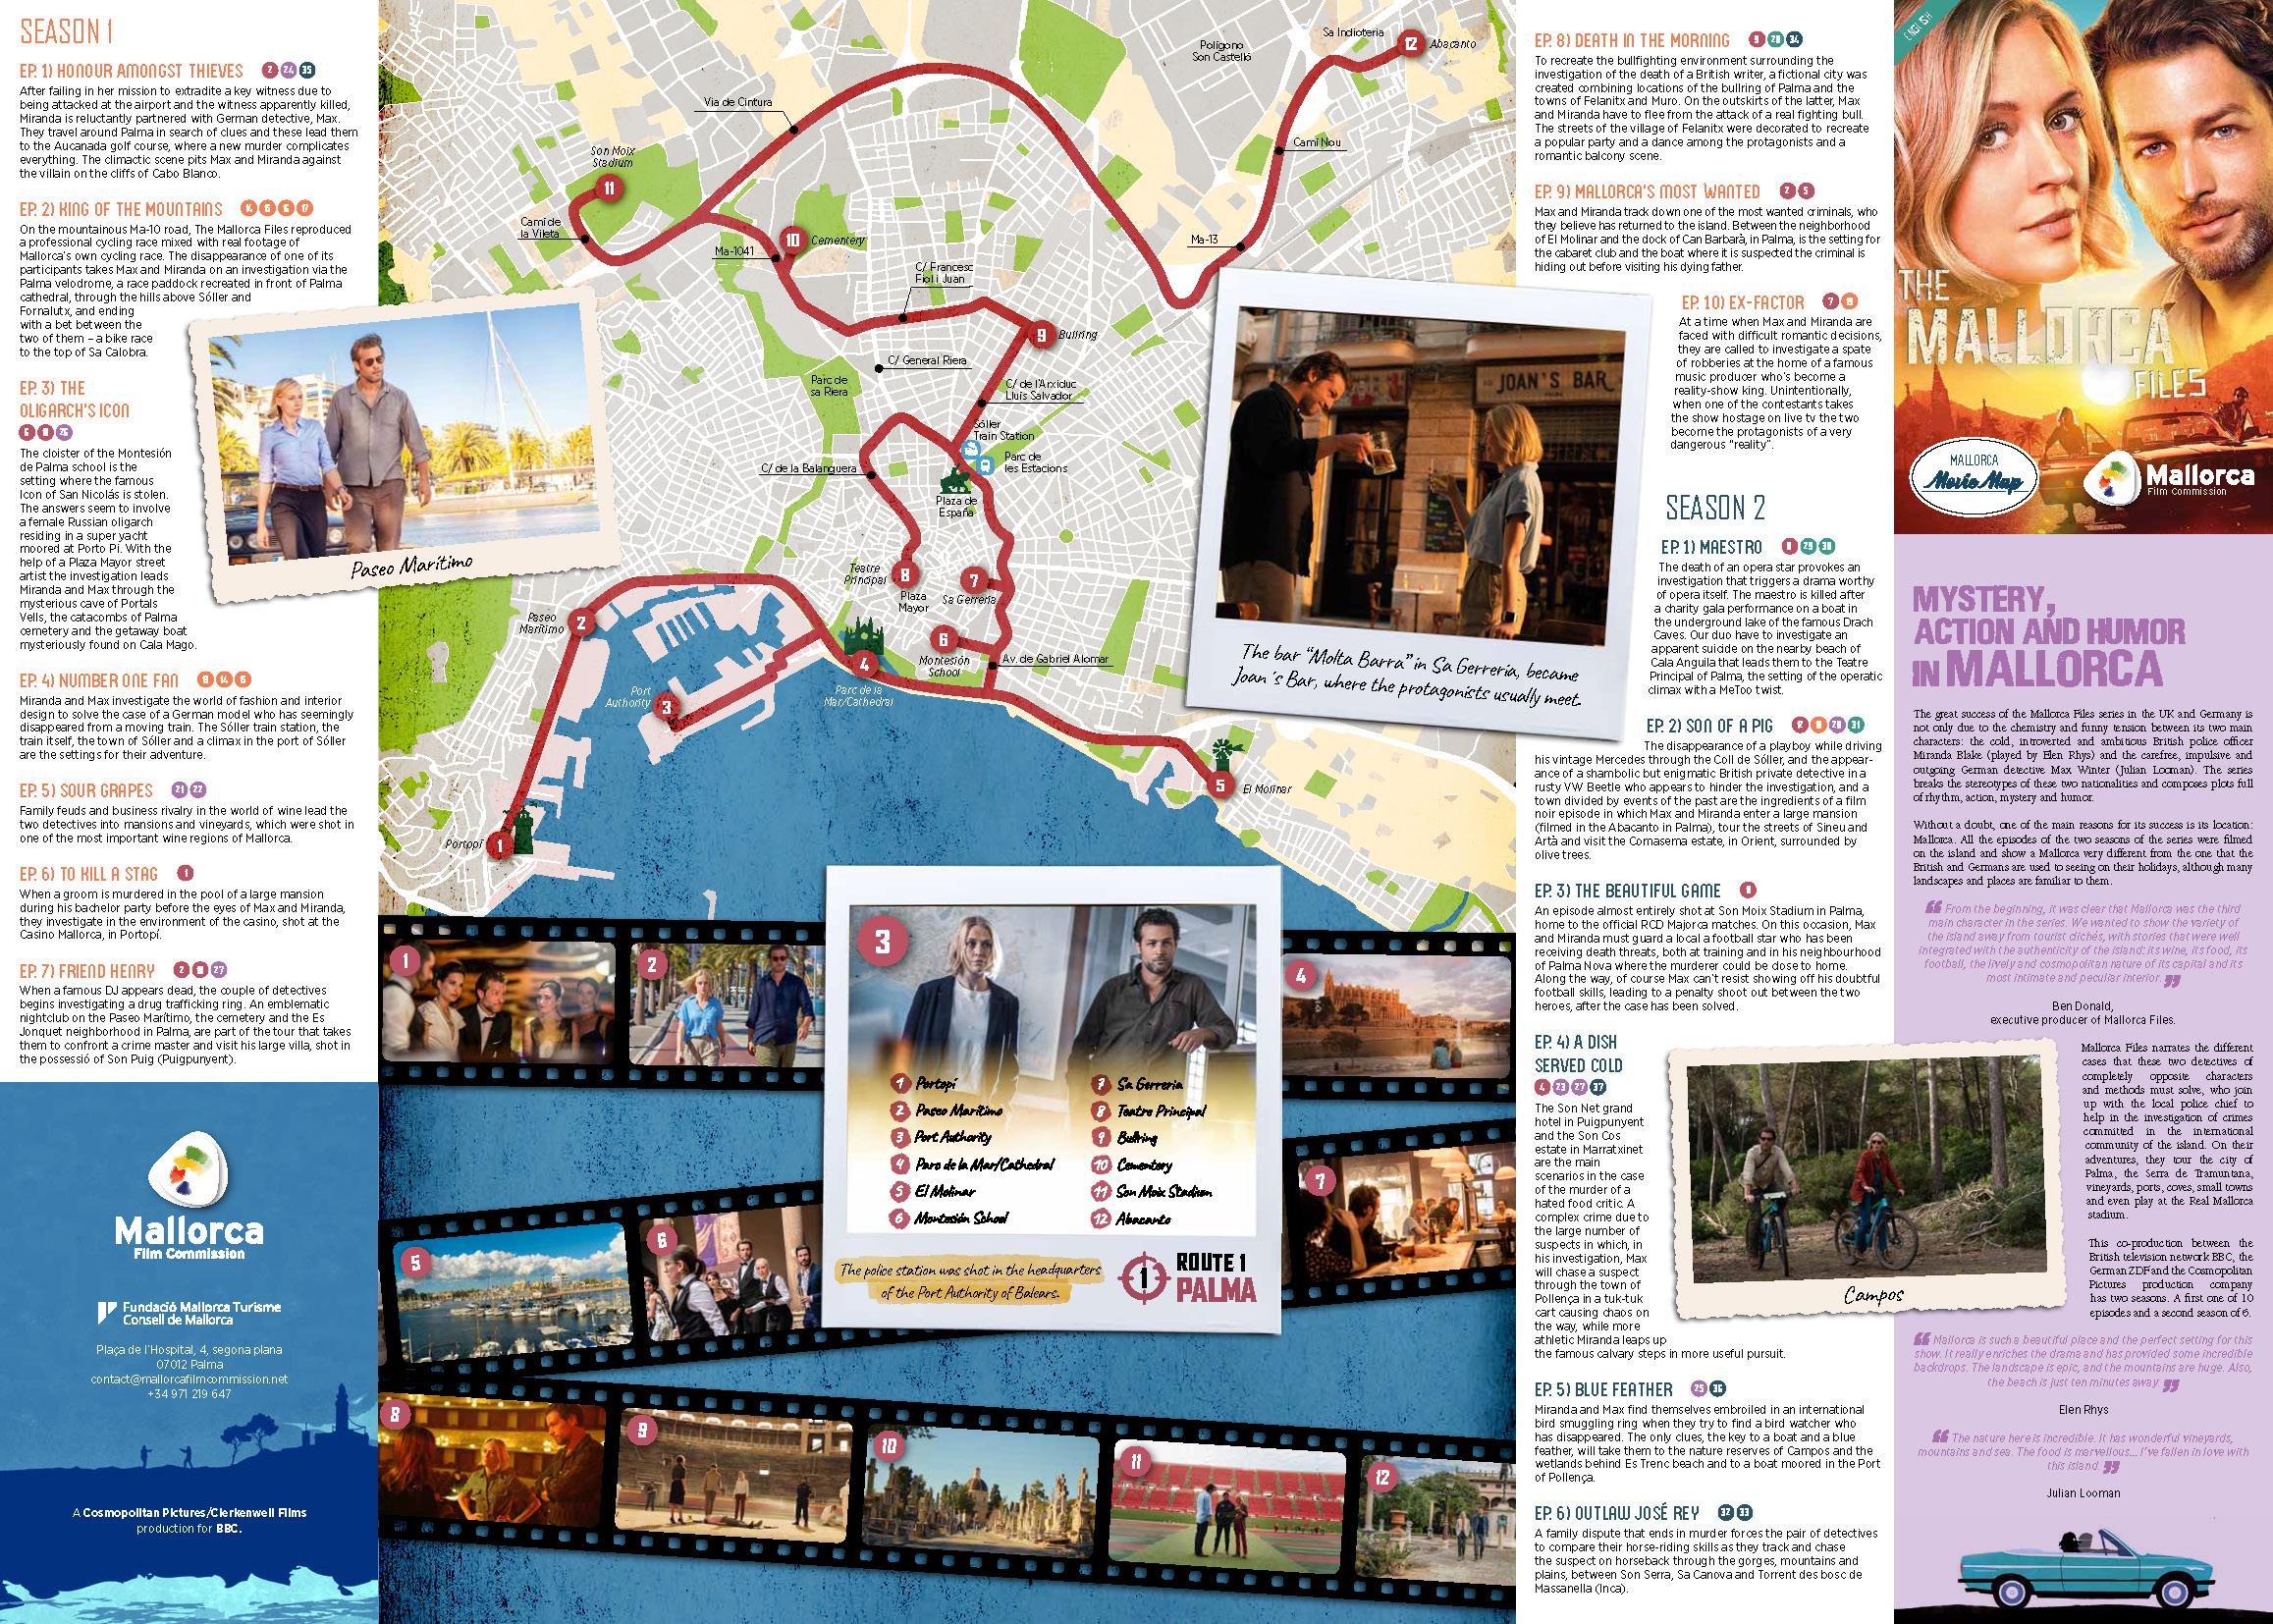 The-Mallorca-Files-Movie-Map_Page_2